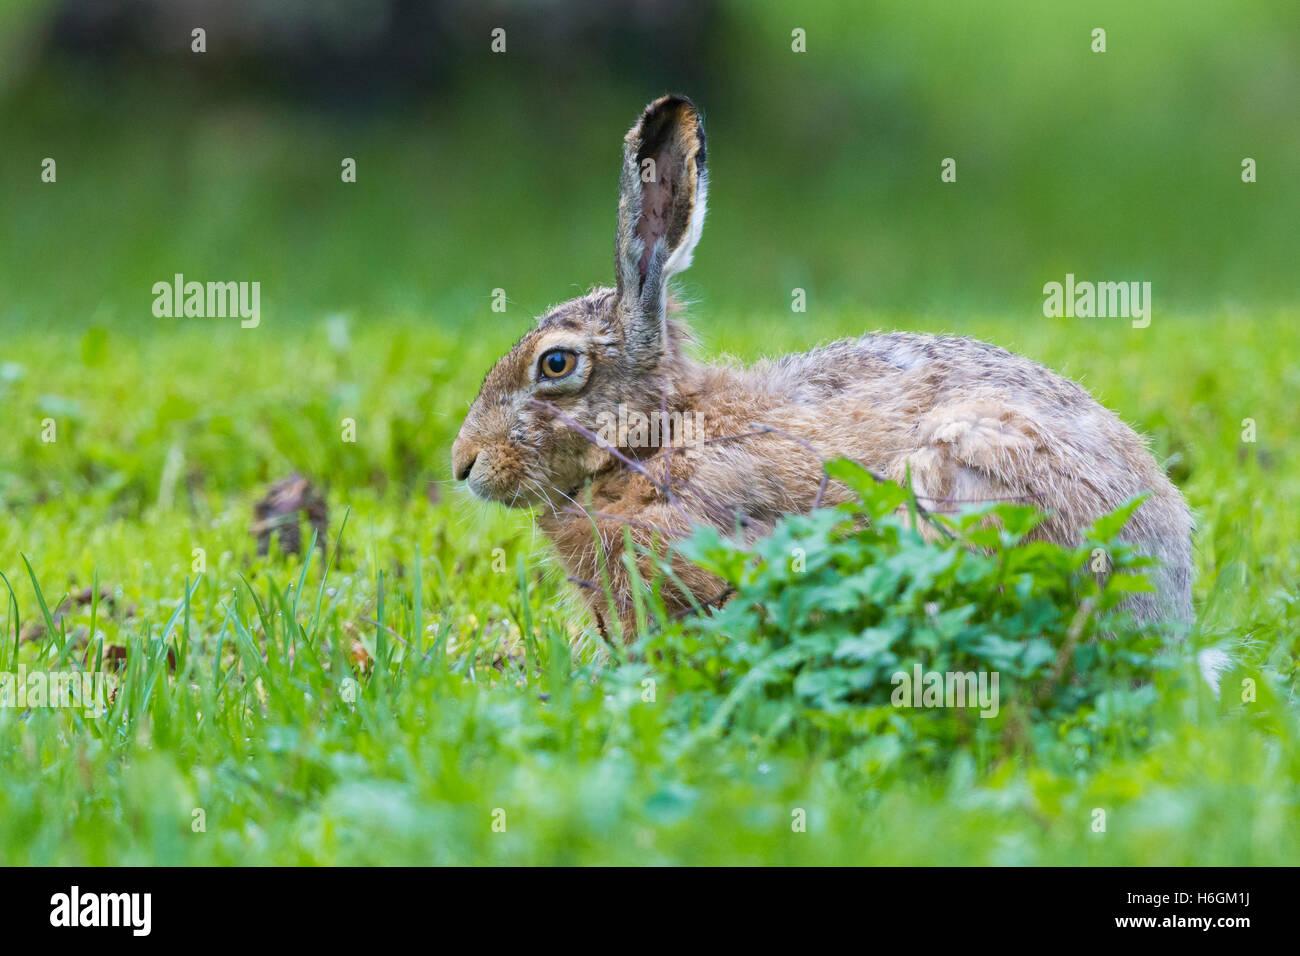 European Hare (Lepus europaeus), standing on the grass - Stock Image